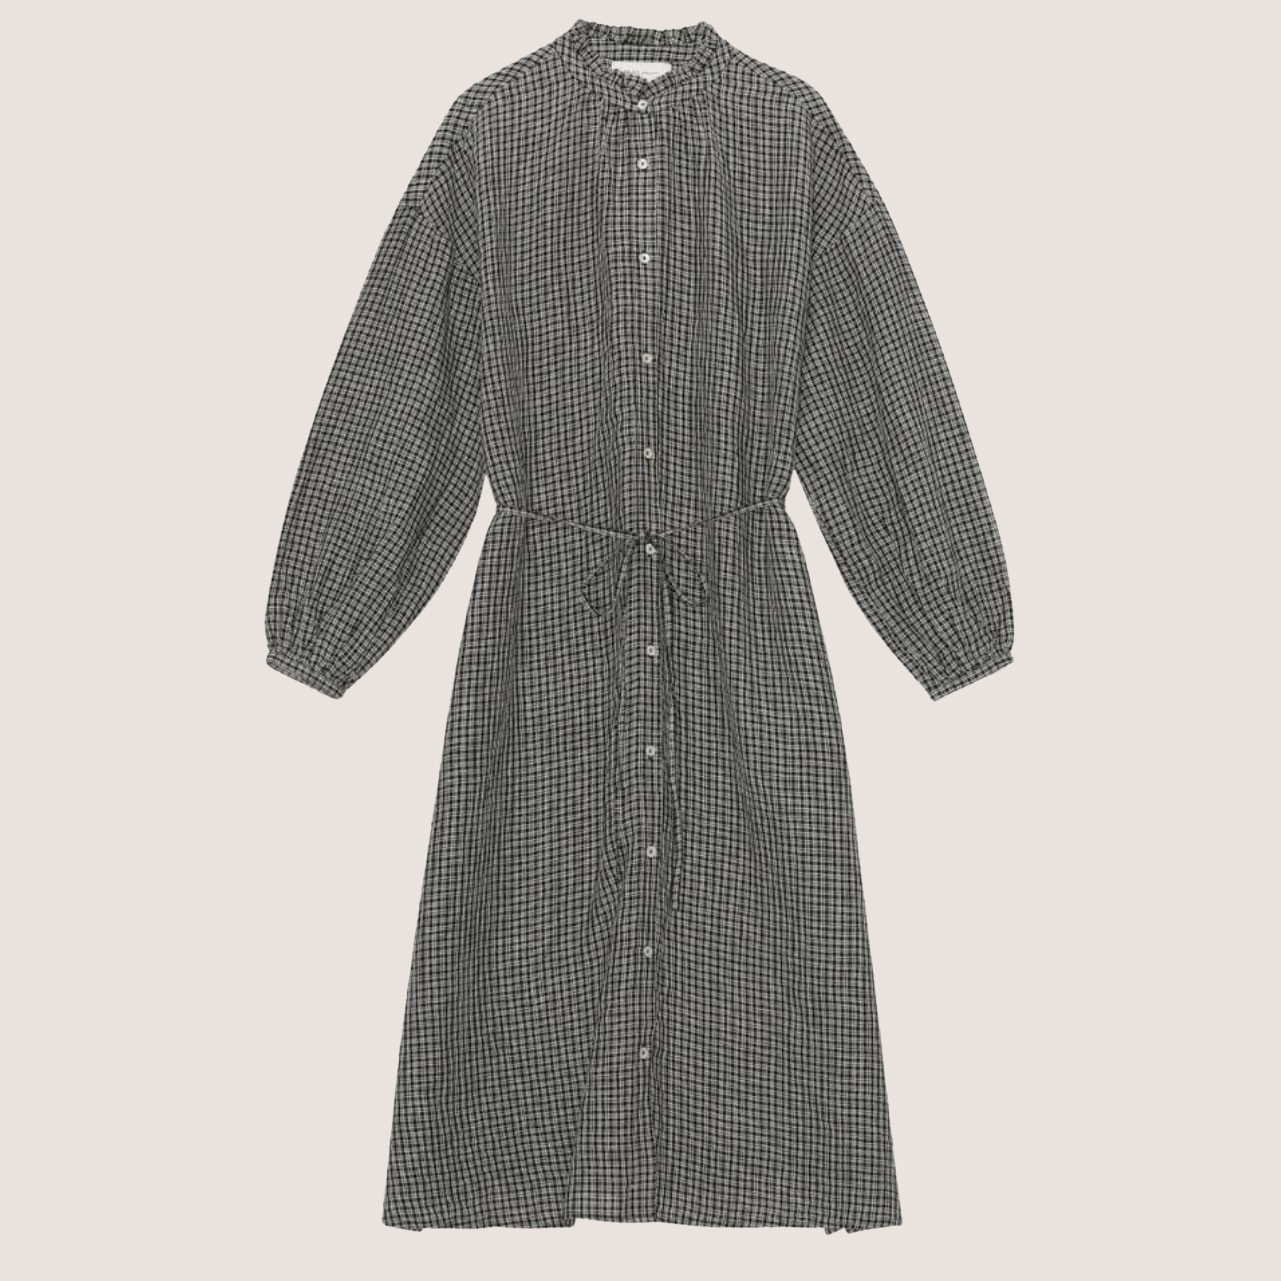 Suzanna Shirtdress - Check